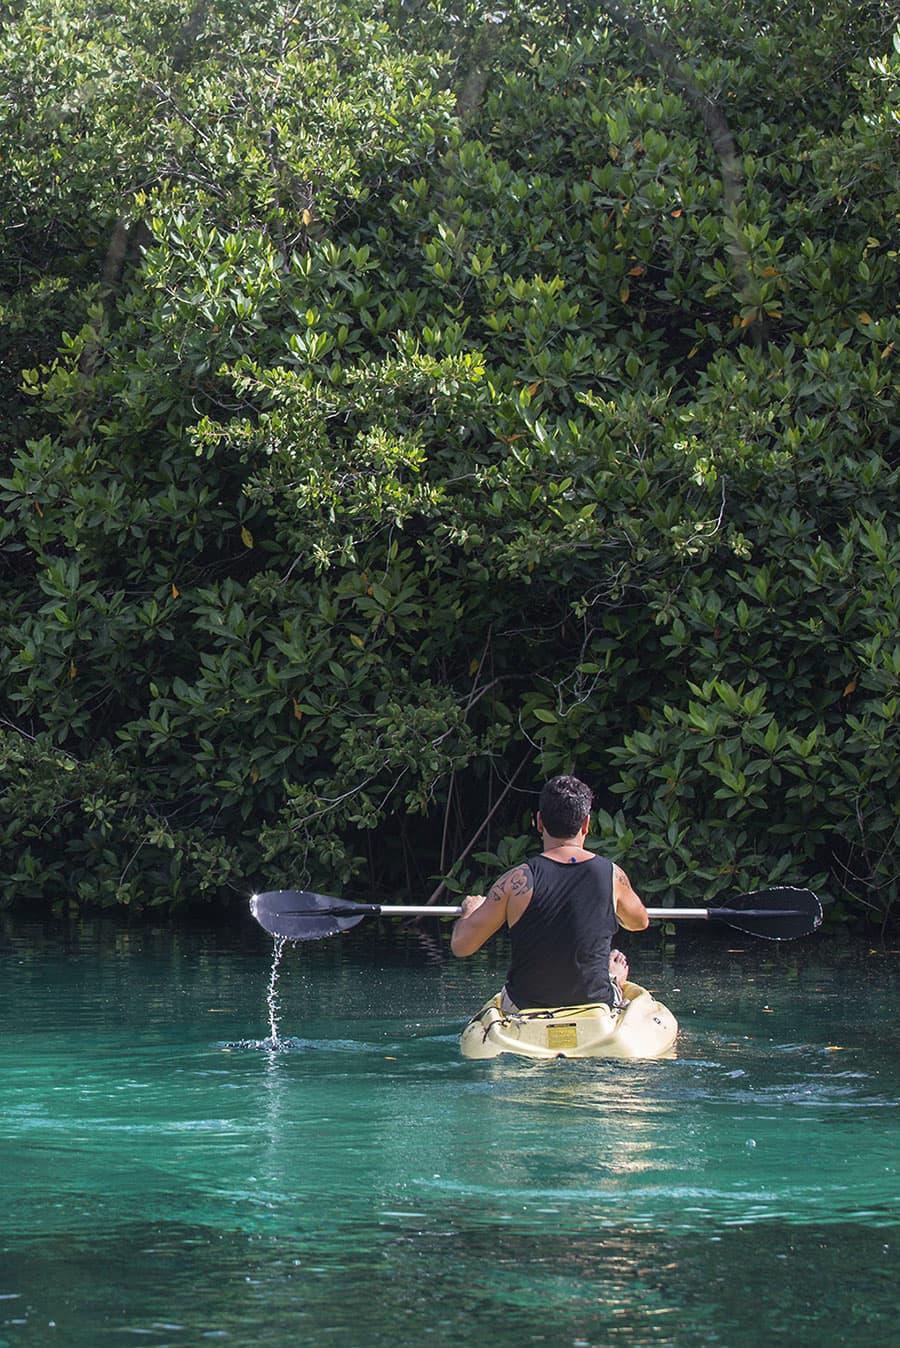 mayan-and-monkey-adenture-tulum-colibri-hotel-jungle